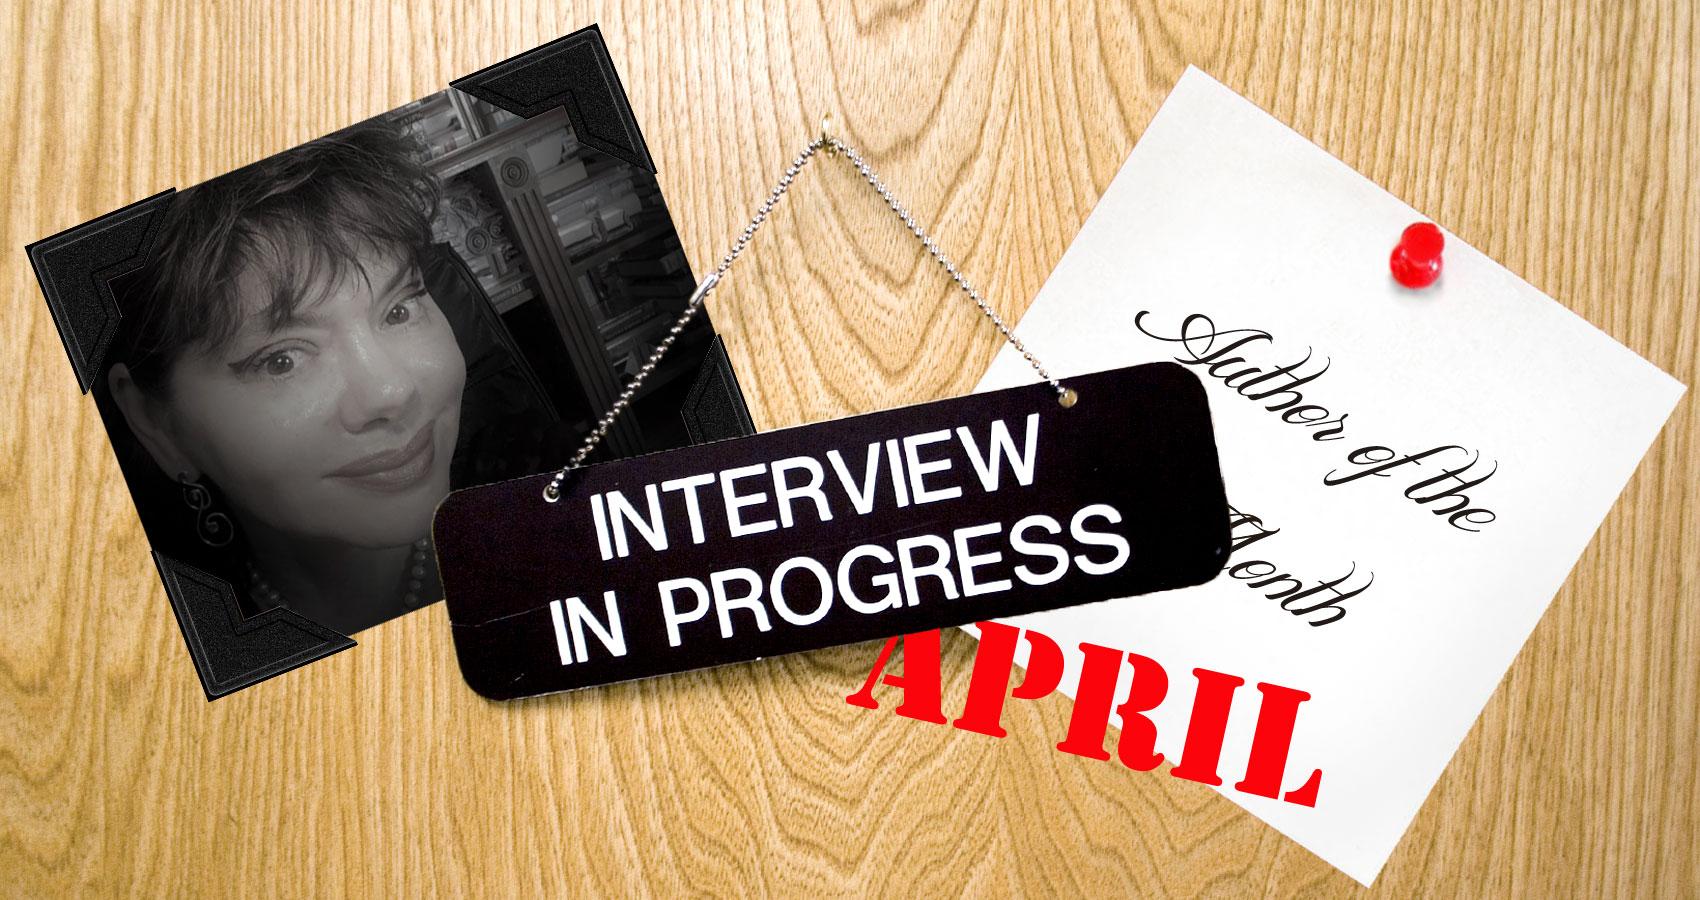 Interview Q&A with Gabriela M, a writer at Spillwords.com